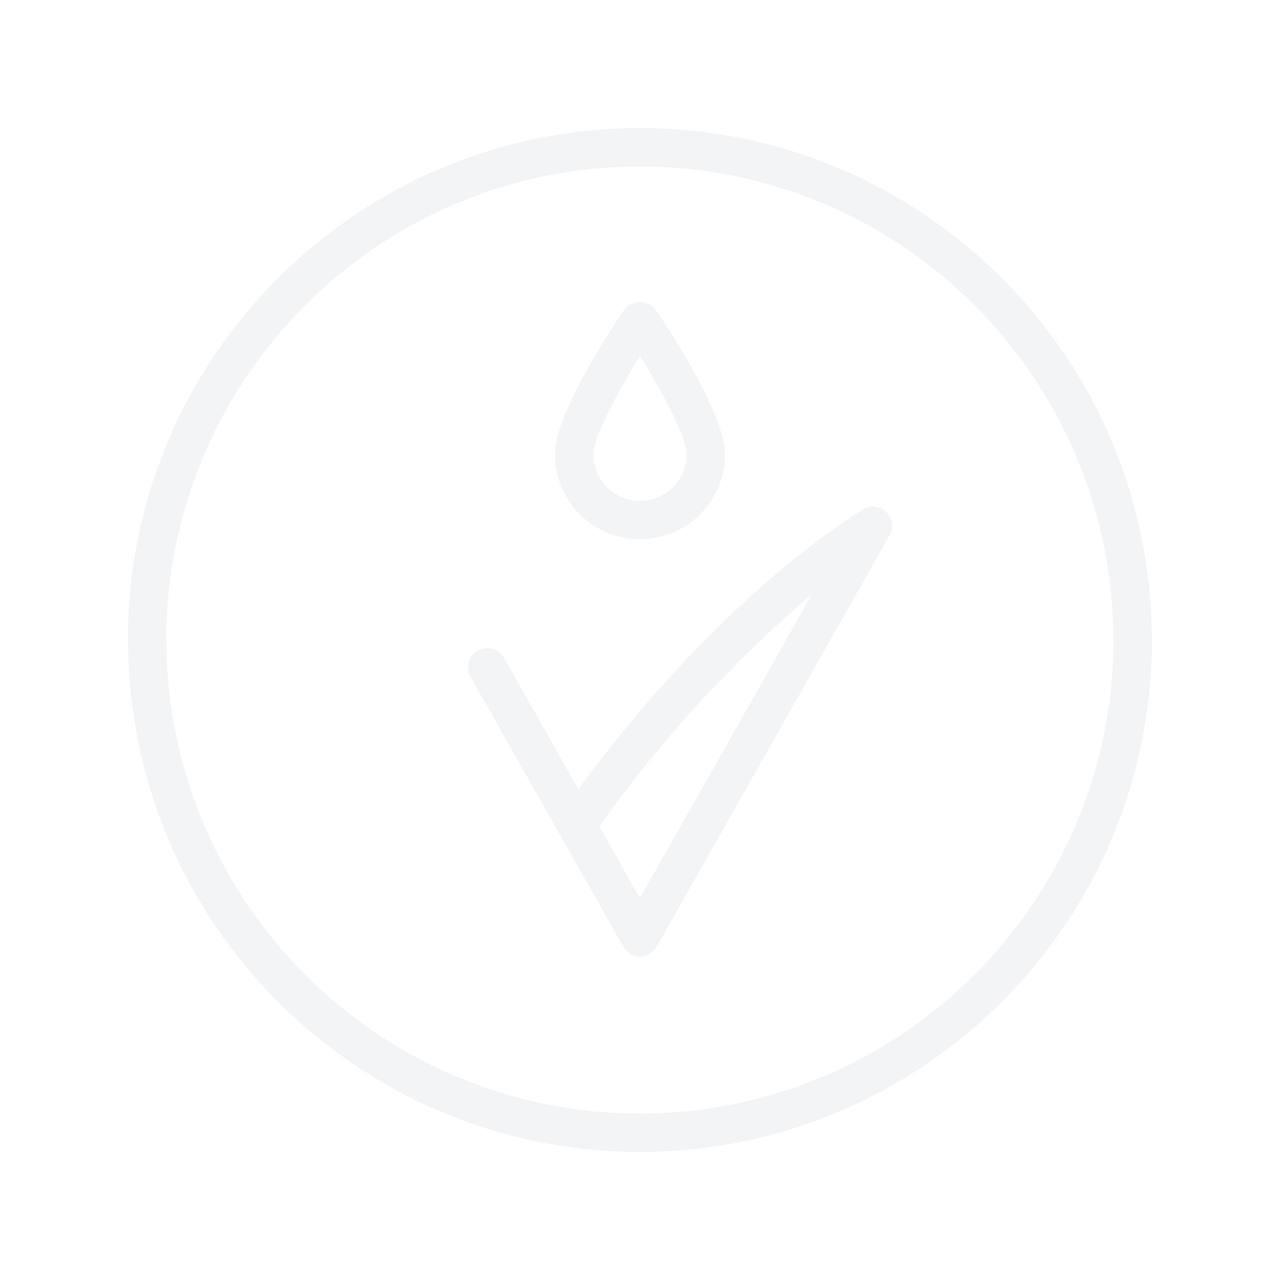 GIORGIO ARMANI Code for Men 125ml Eau De Toilette Gift Set